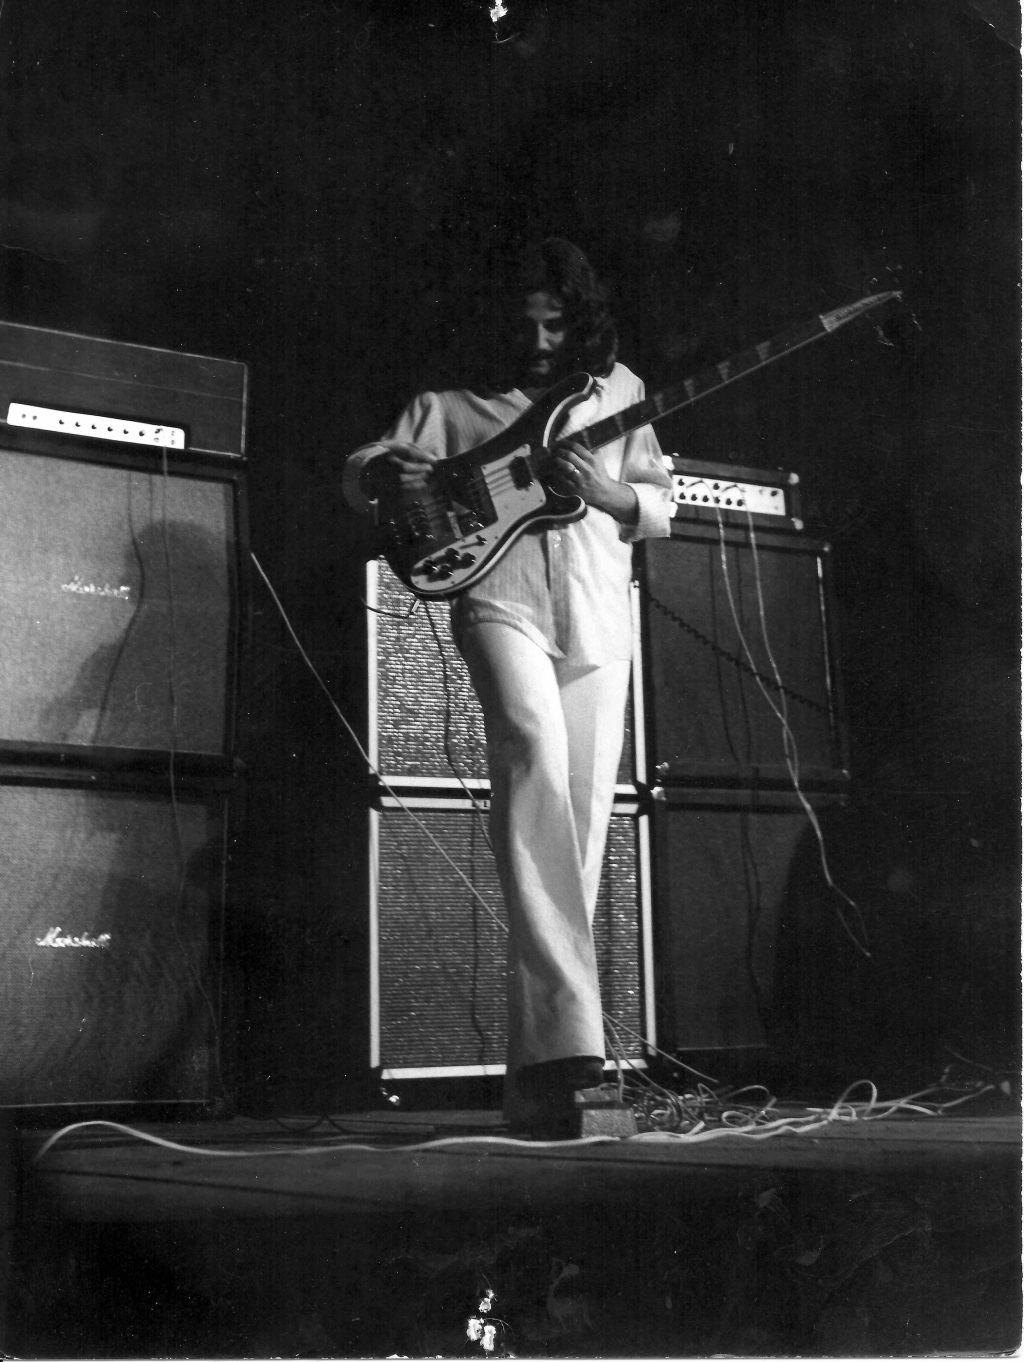 Caserta 1976